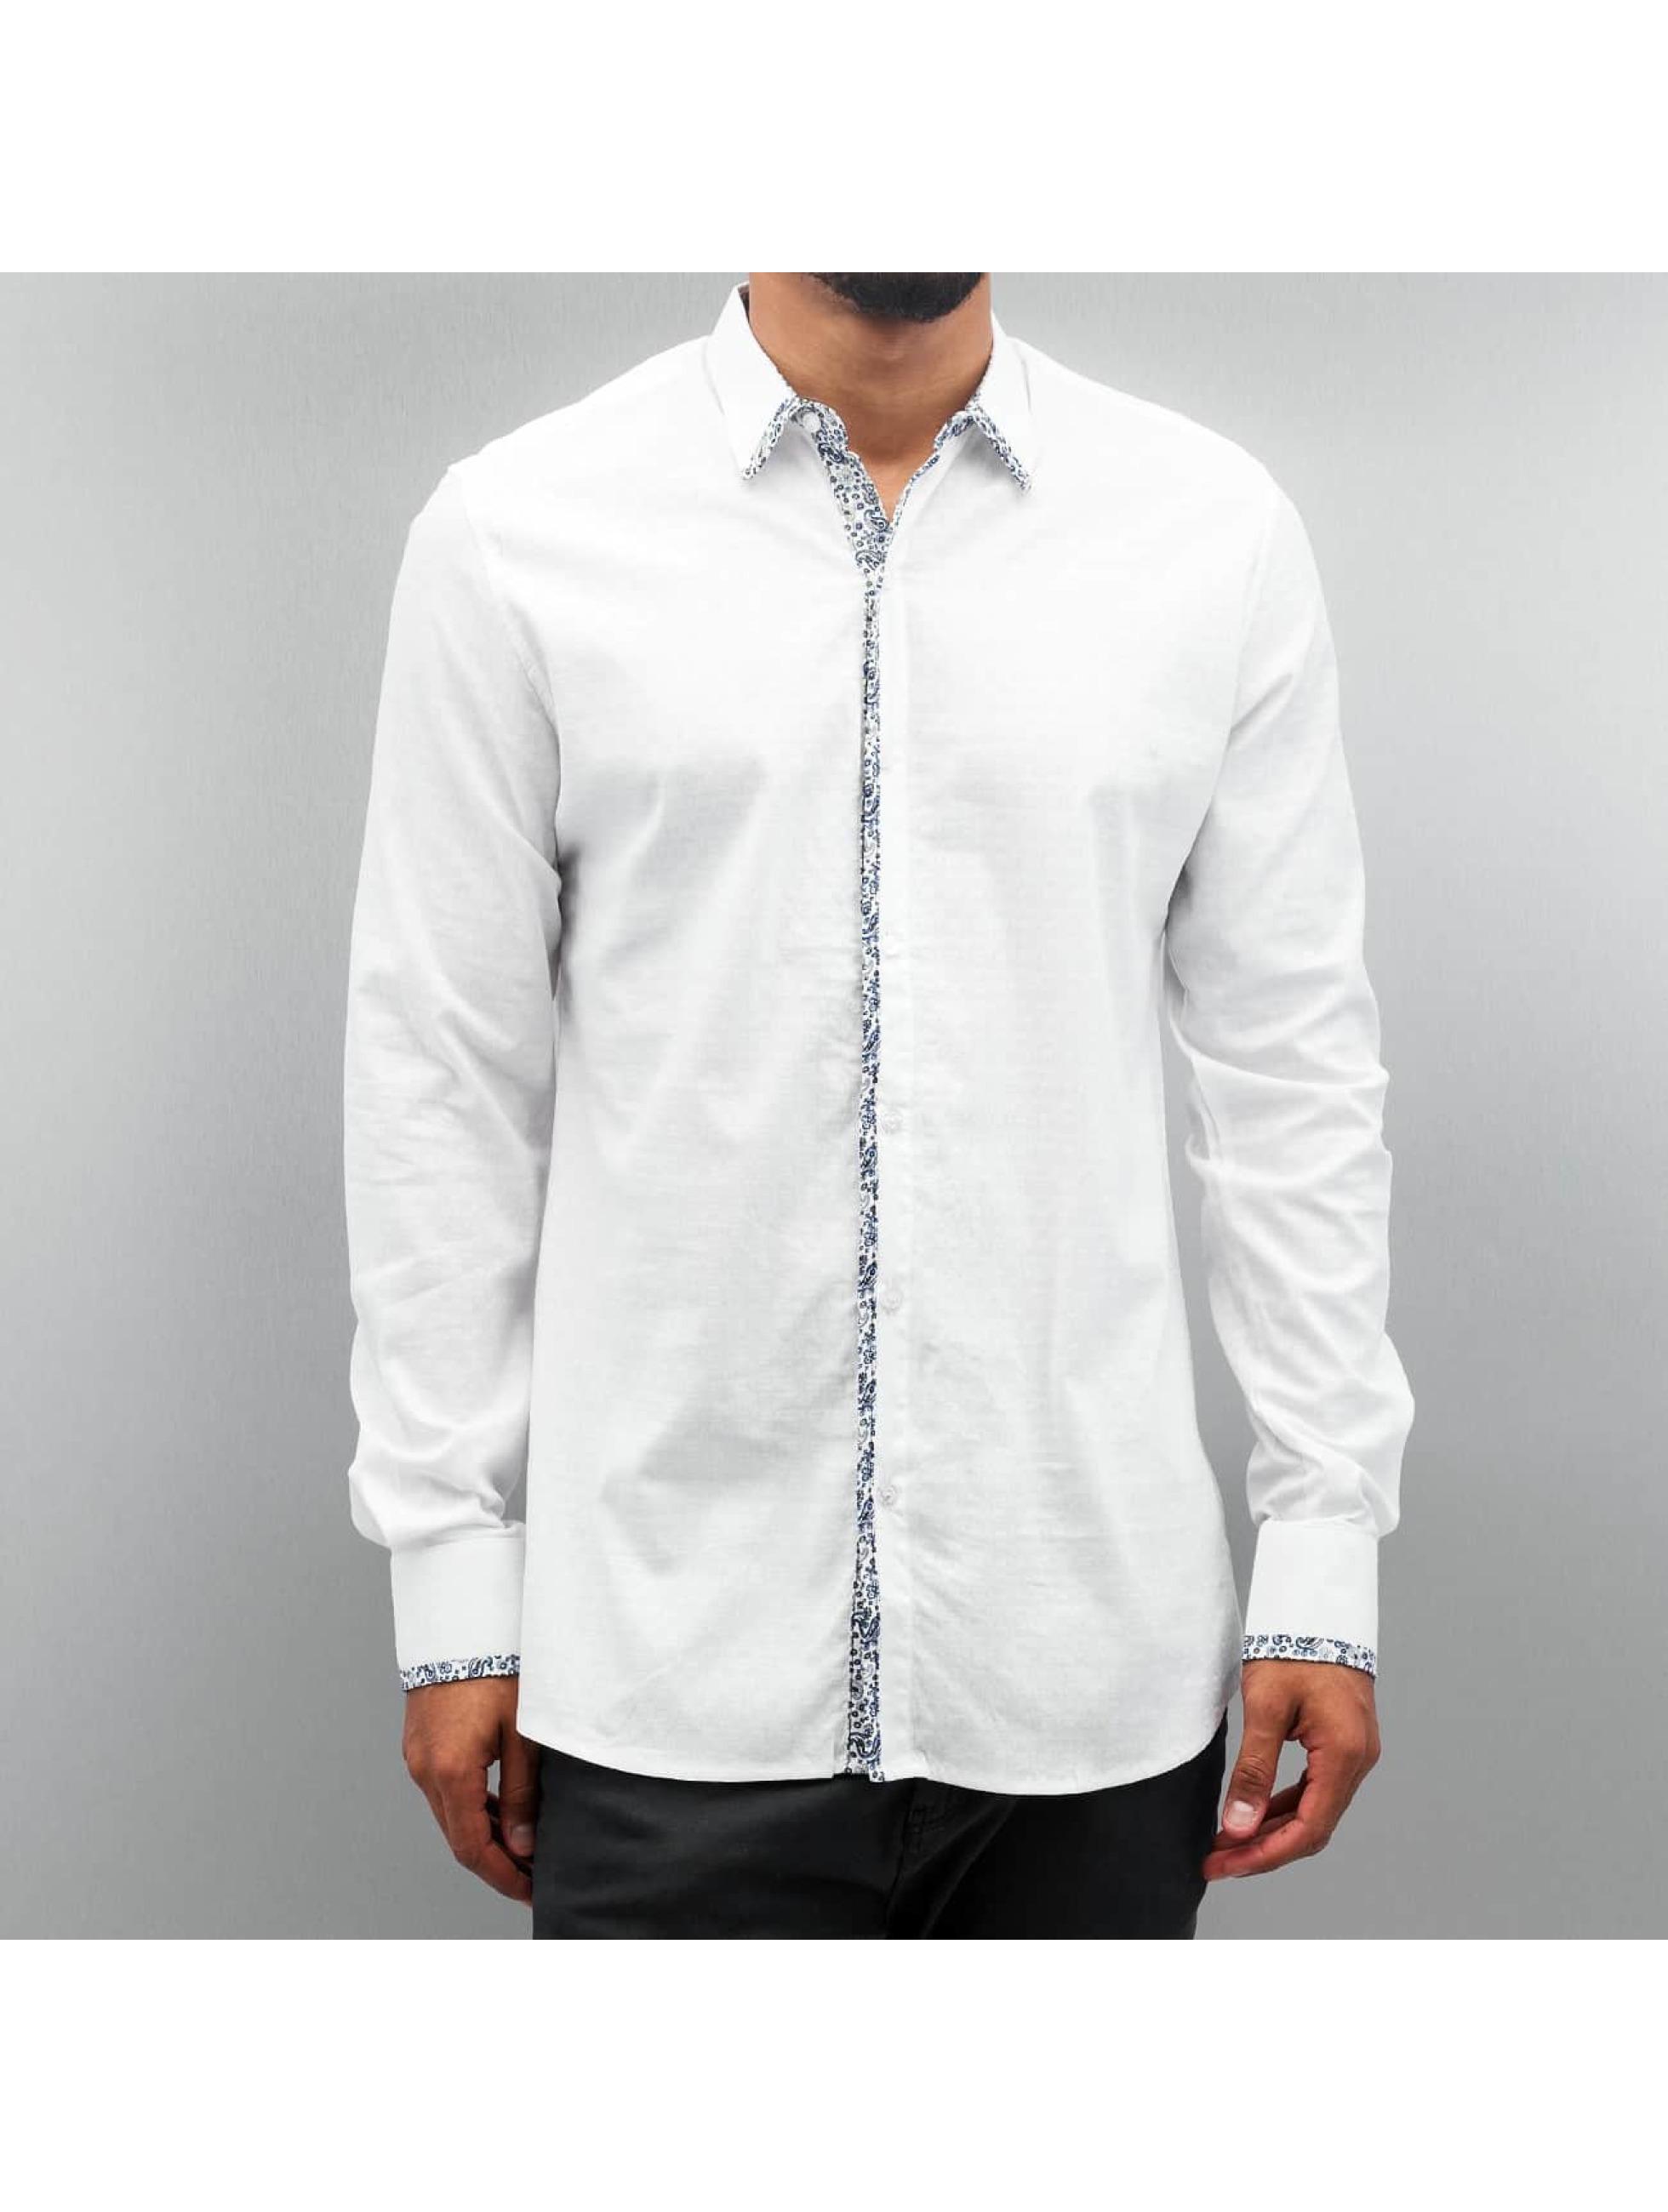 Open overhemd Paisley wit